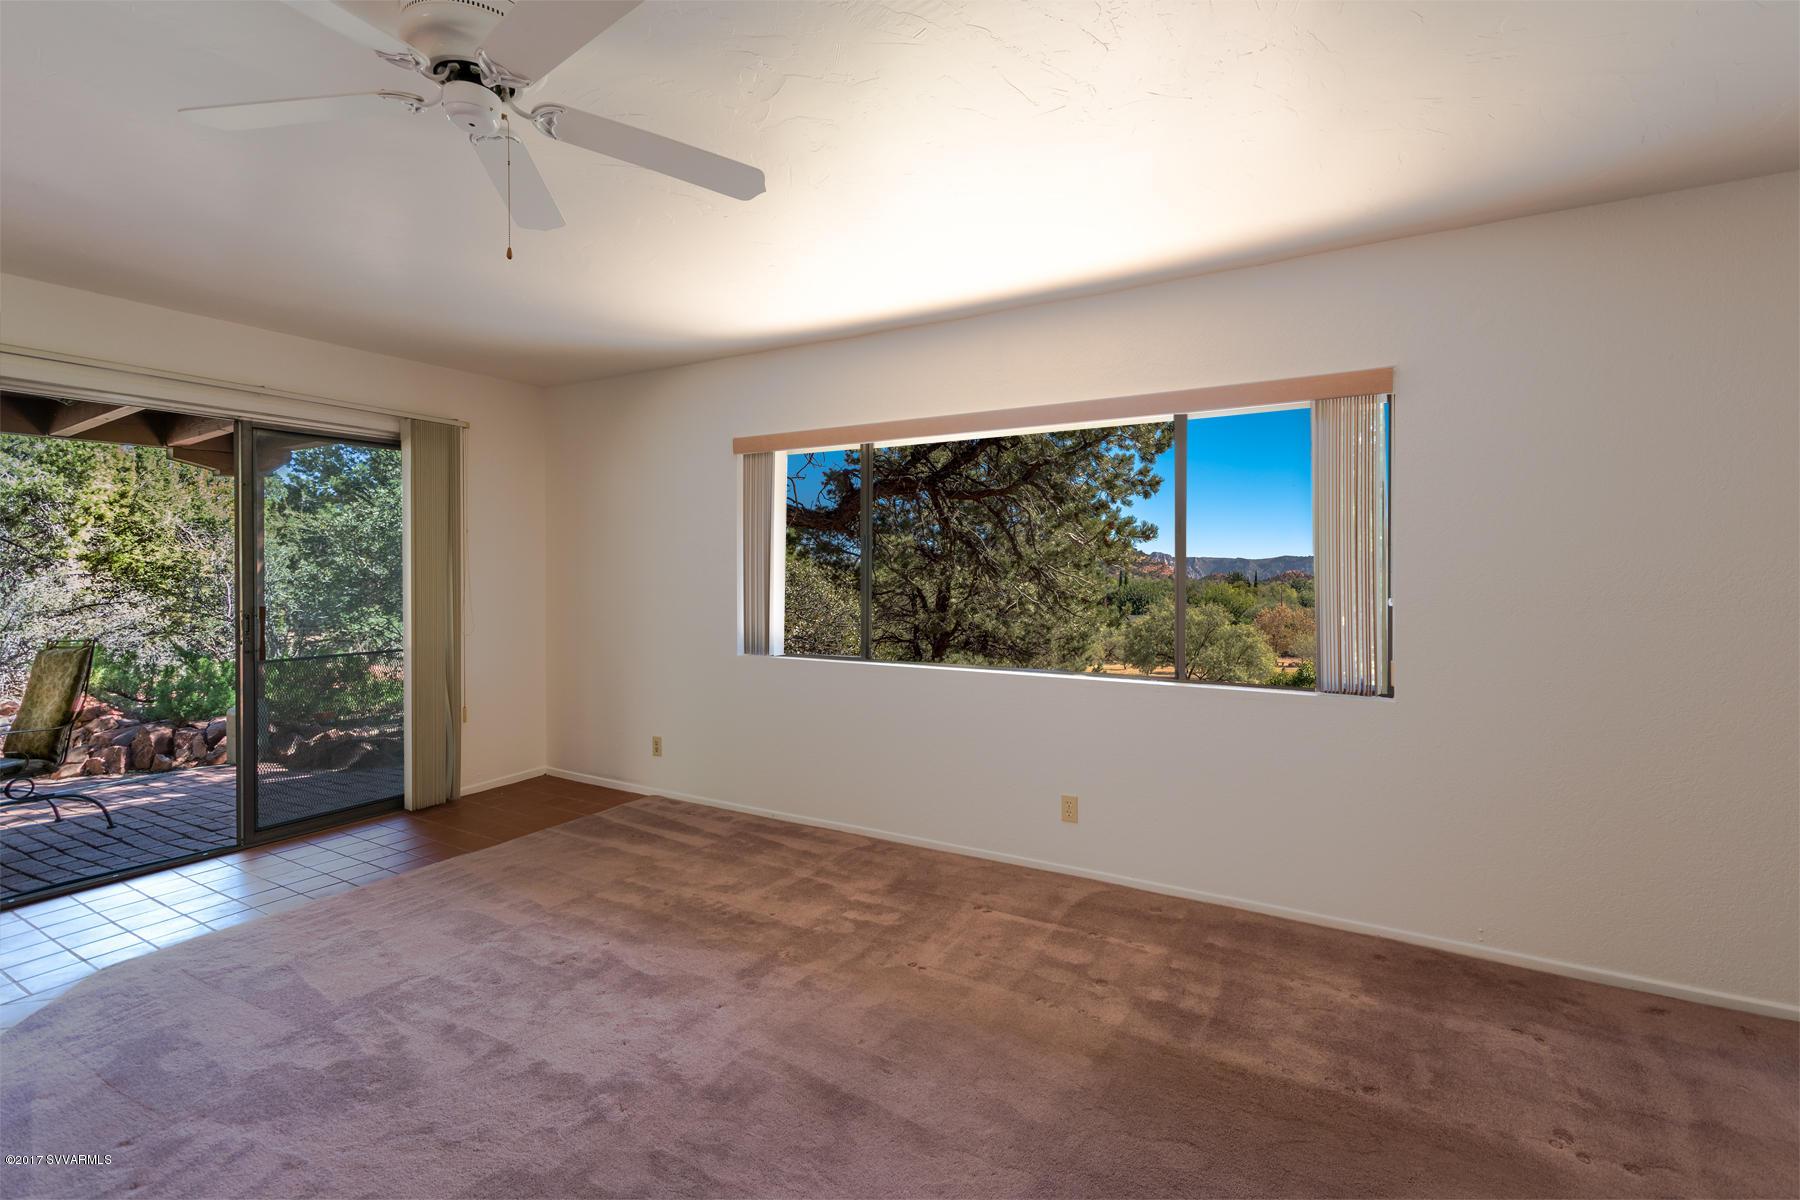 225 Northview Rd Sedona, AZ 86336